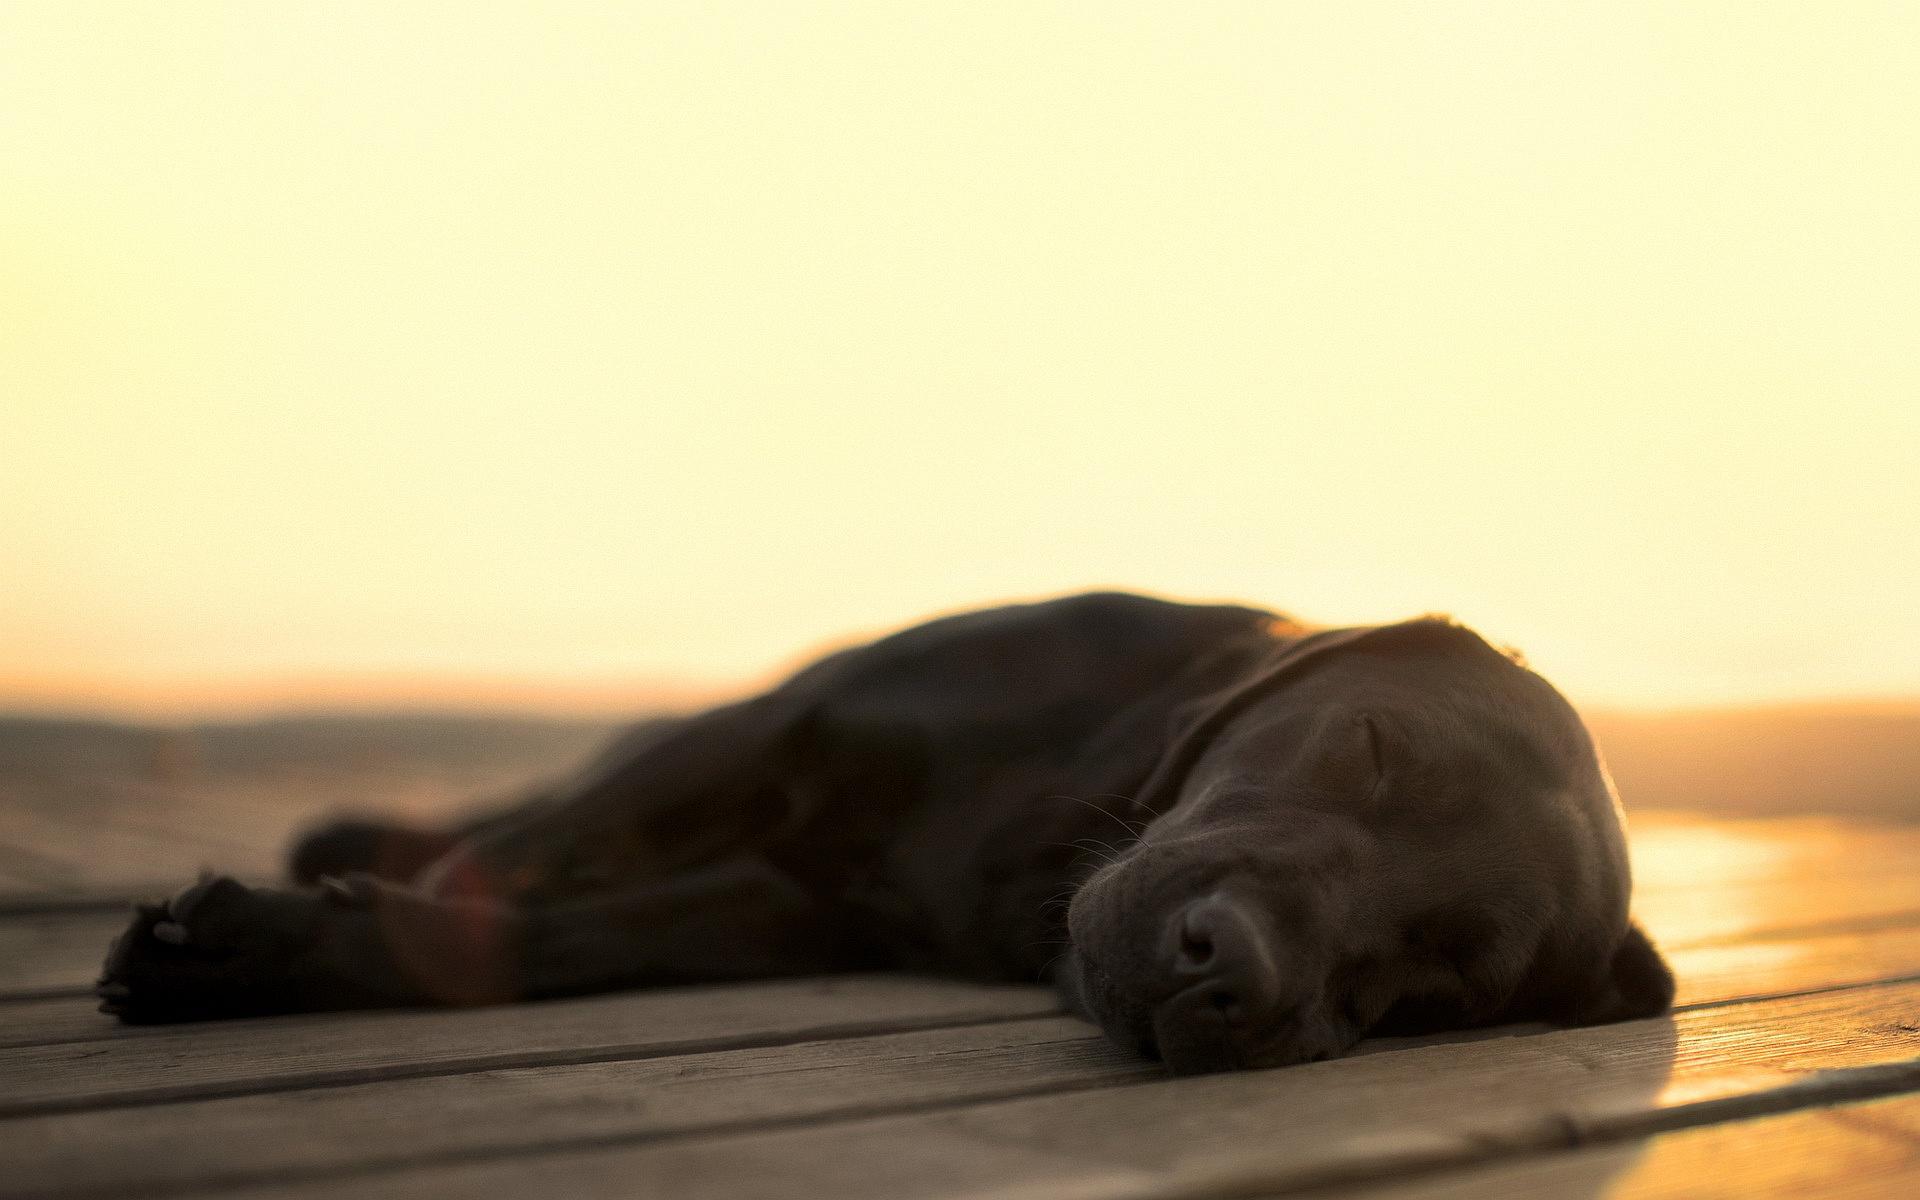 6770314-amazing-sleeping-dog-wallpaper | Phantom Forest Blog